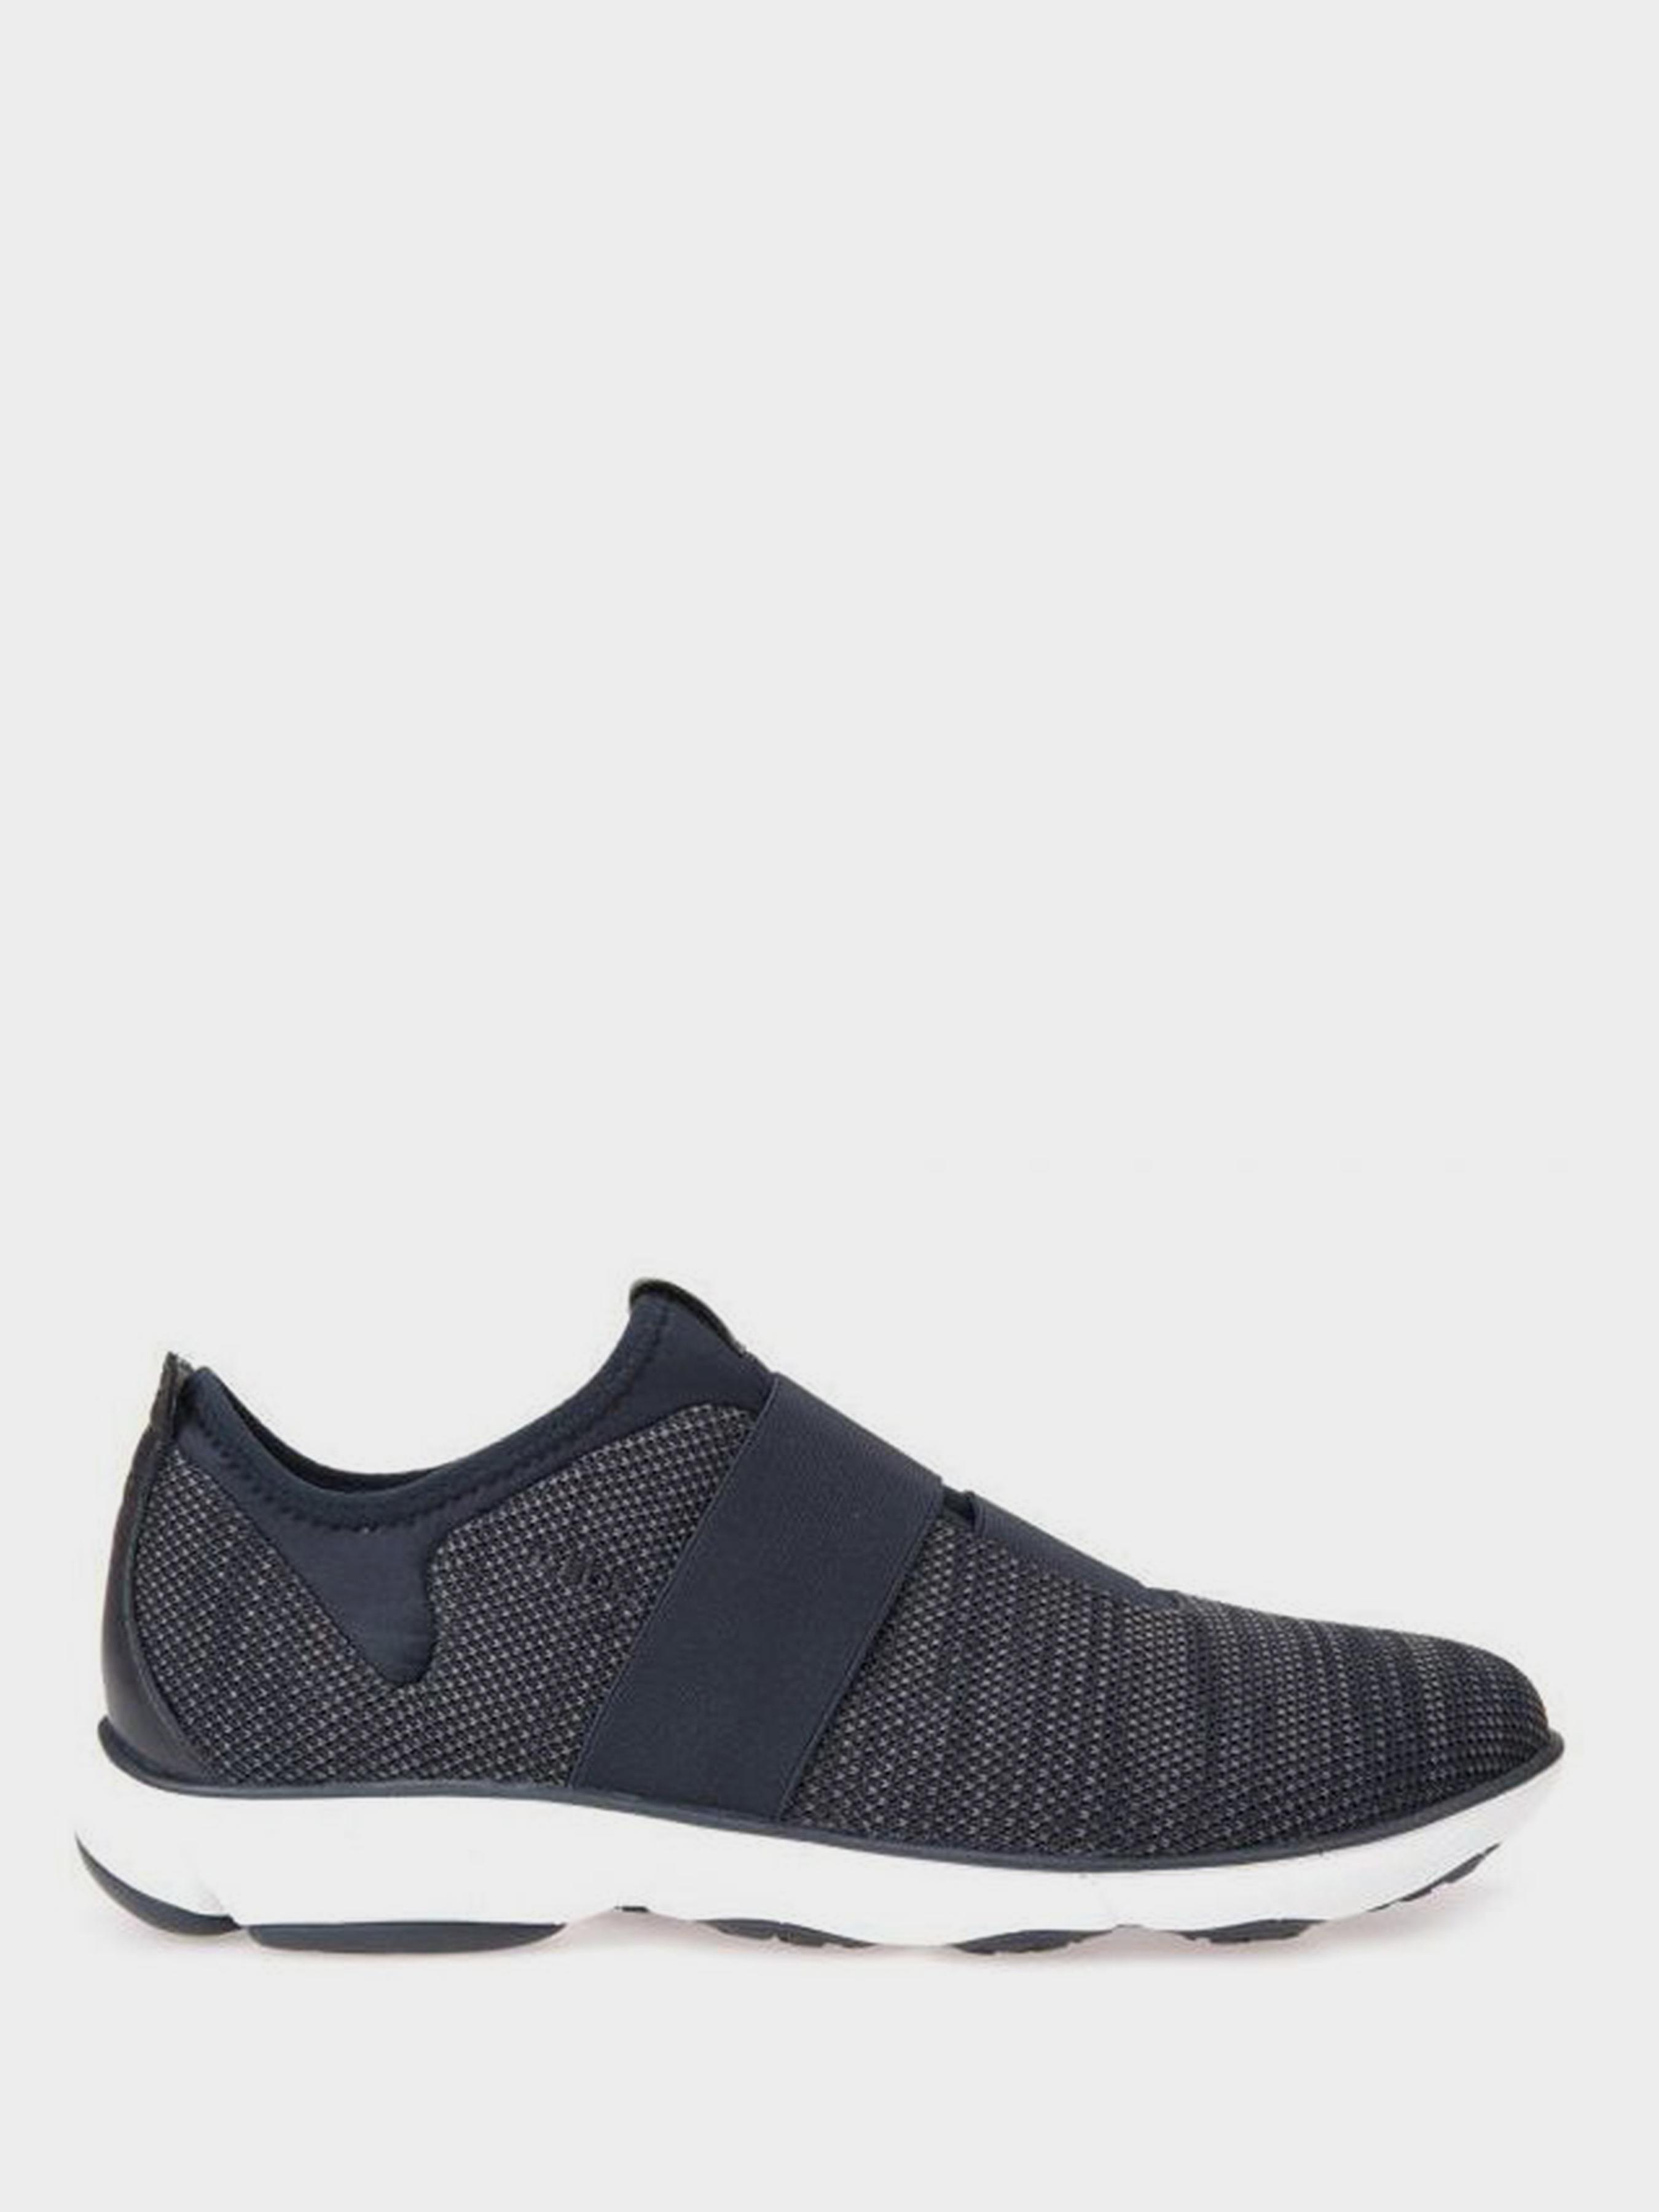 Кроссовки для мужчин Geox U NEBULA G - TESS. A MAGLIA XM1830 размеры обуви, 2017